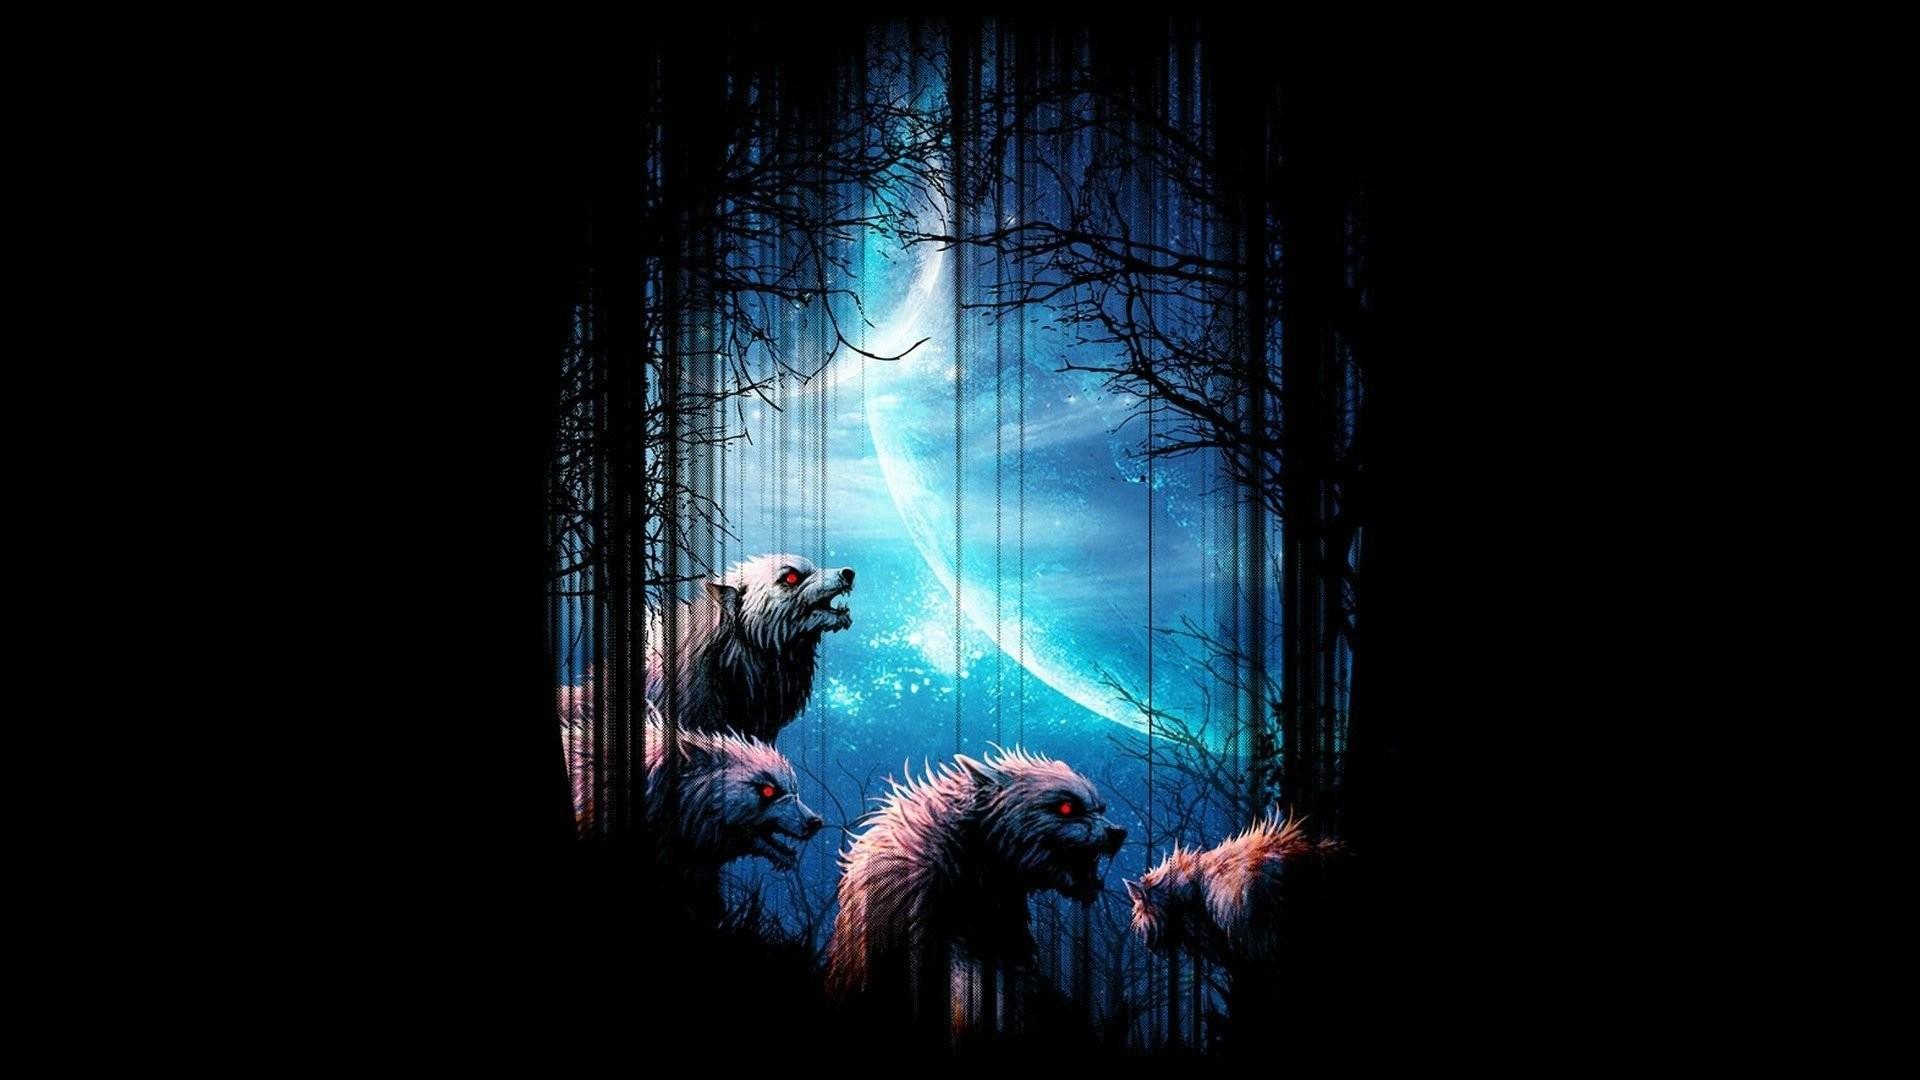 Full HD 1080p Wolf Wallpapers HD Desktop Backgrounds